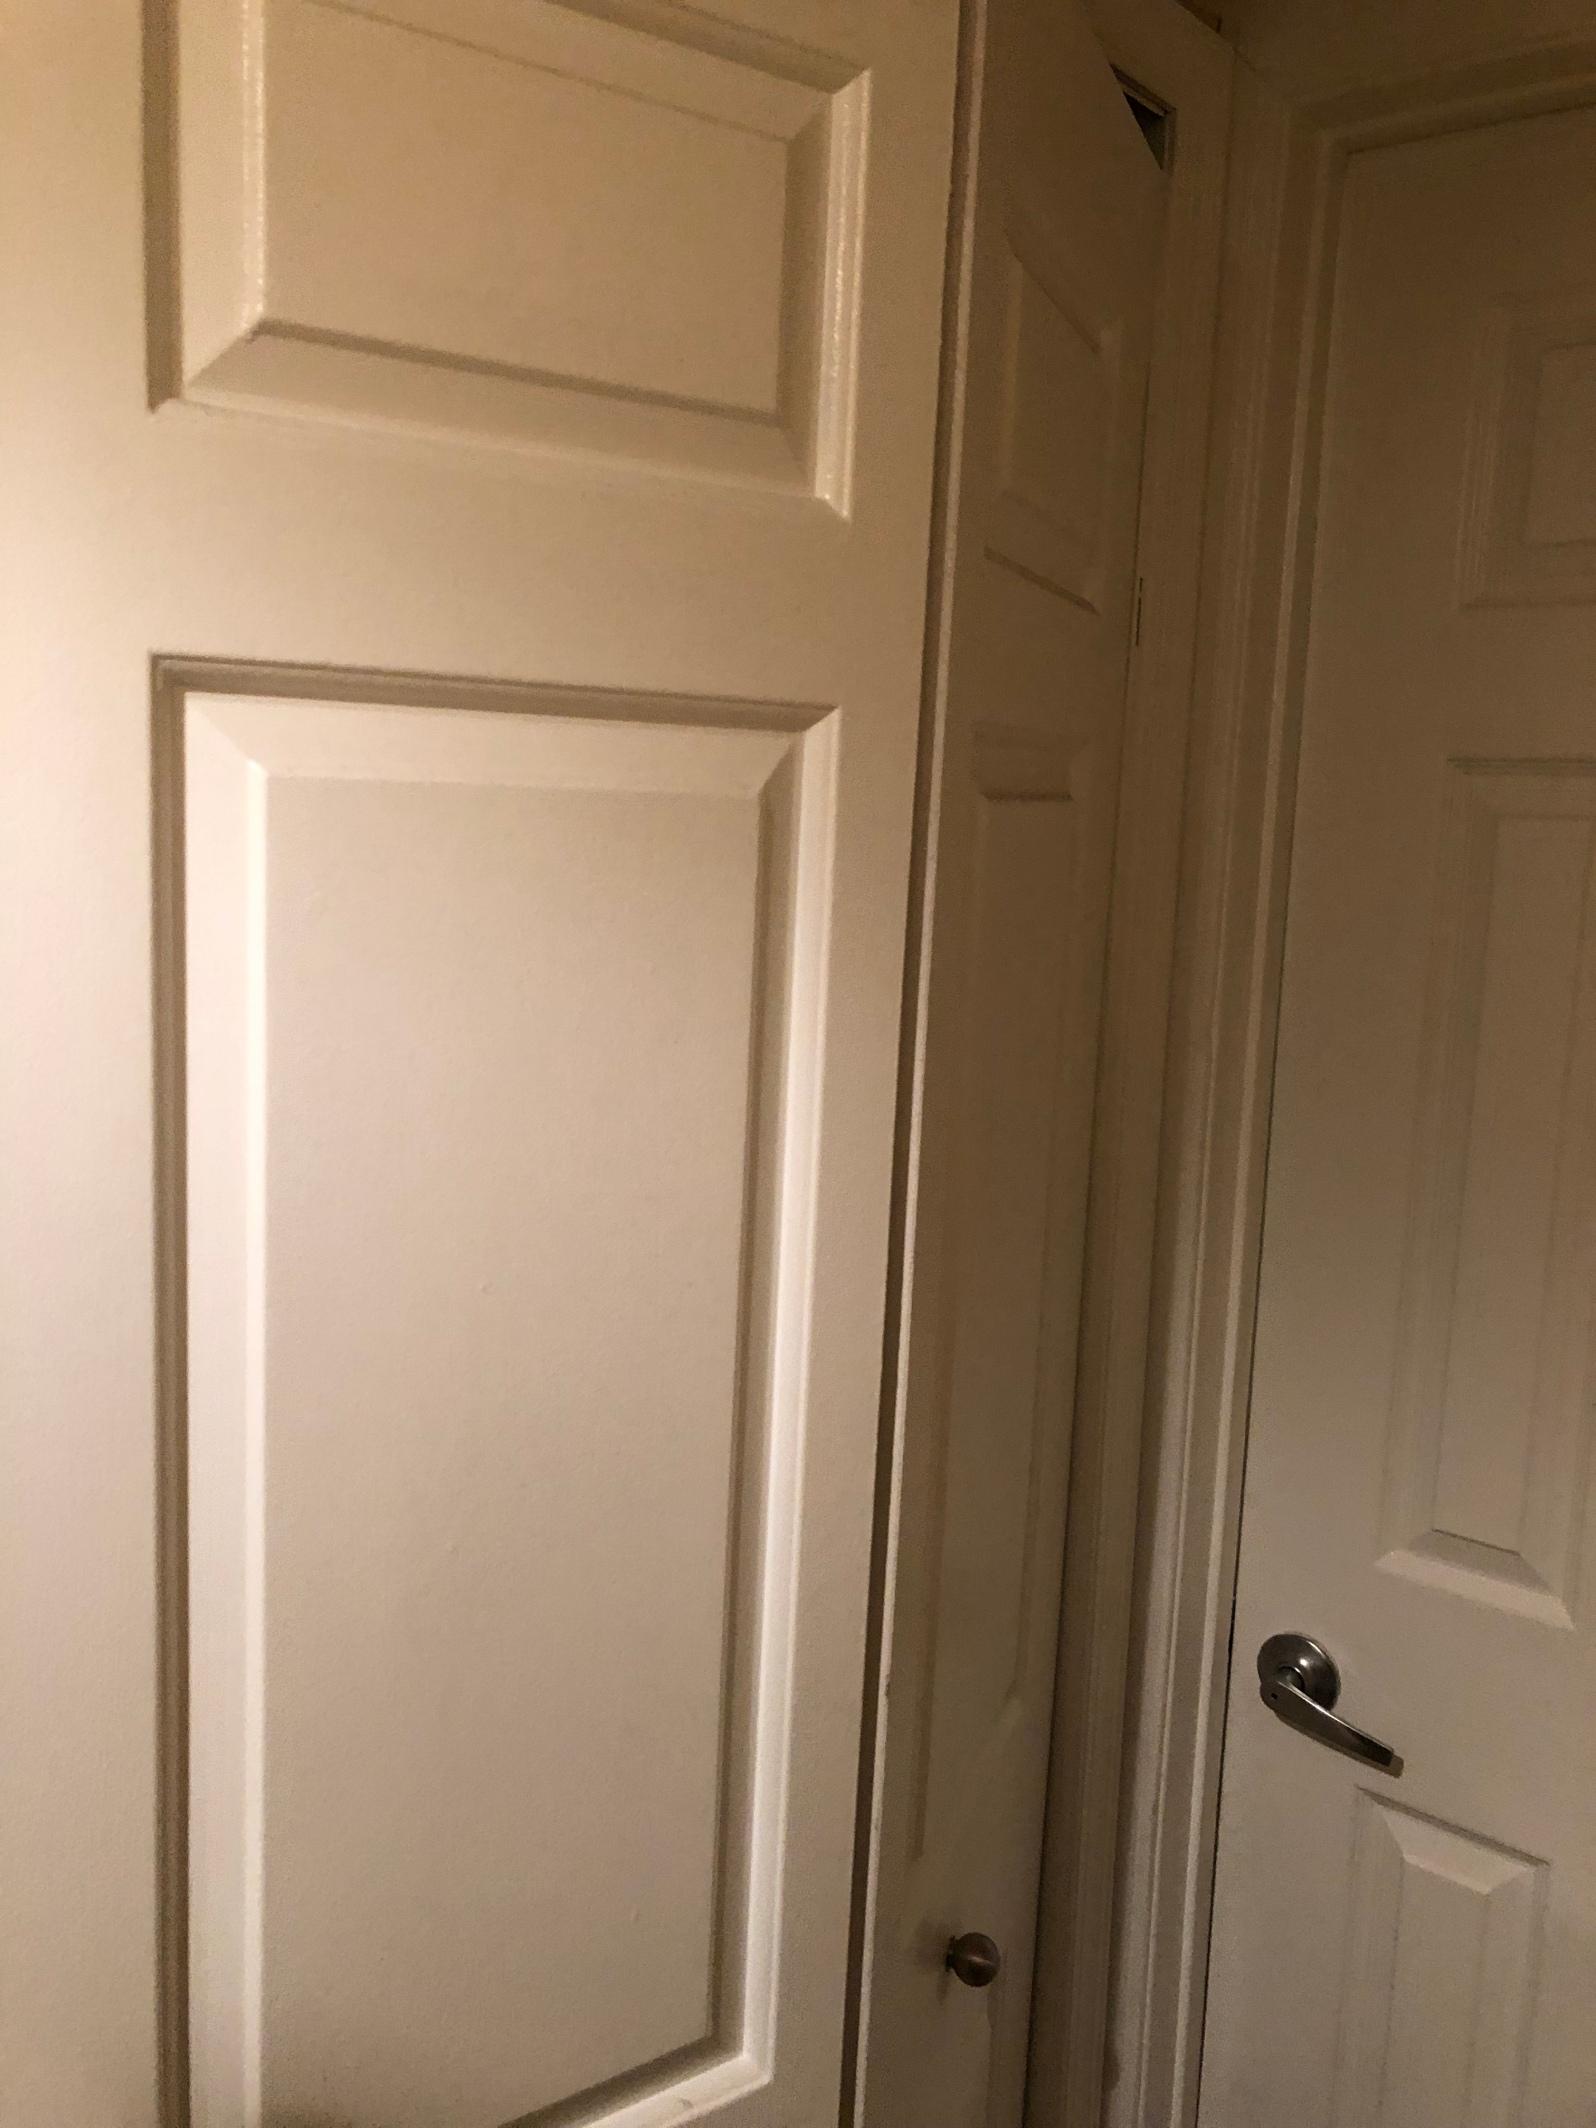 The original bi-fold door